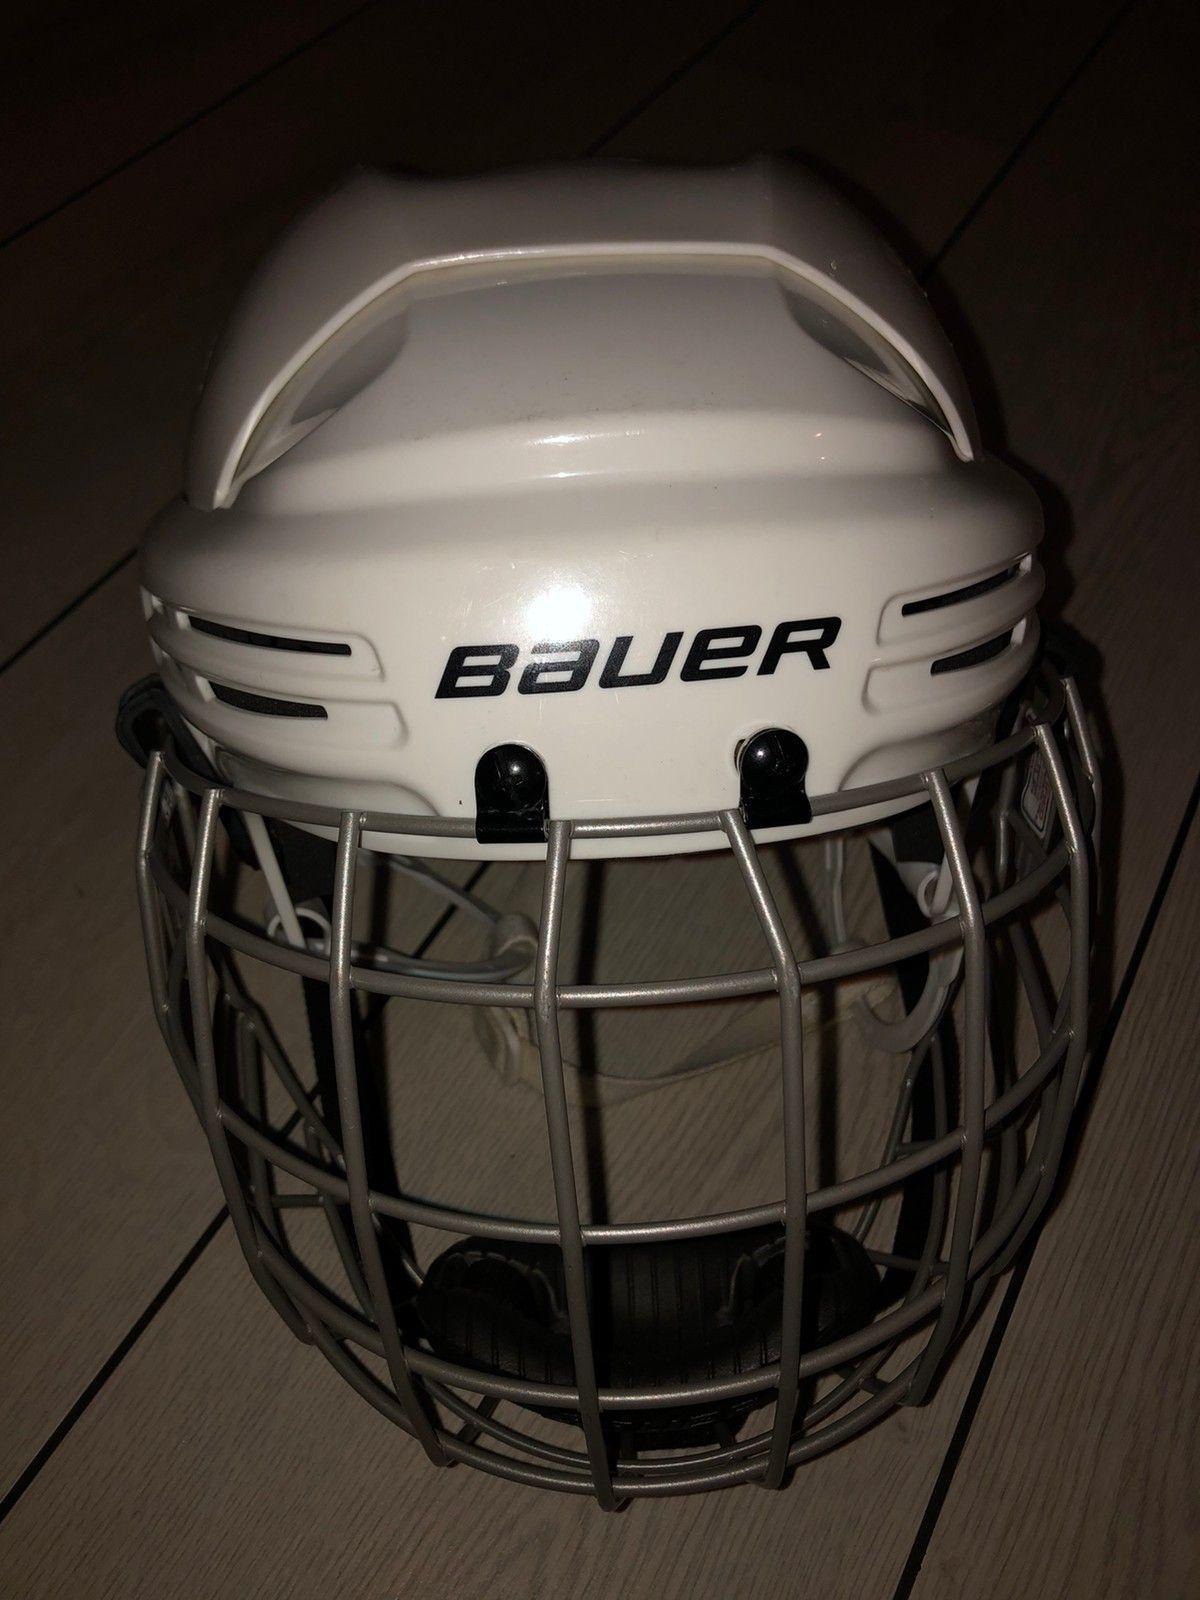 Bauer hockey bukse. | FINN.no